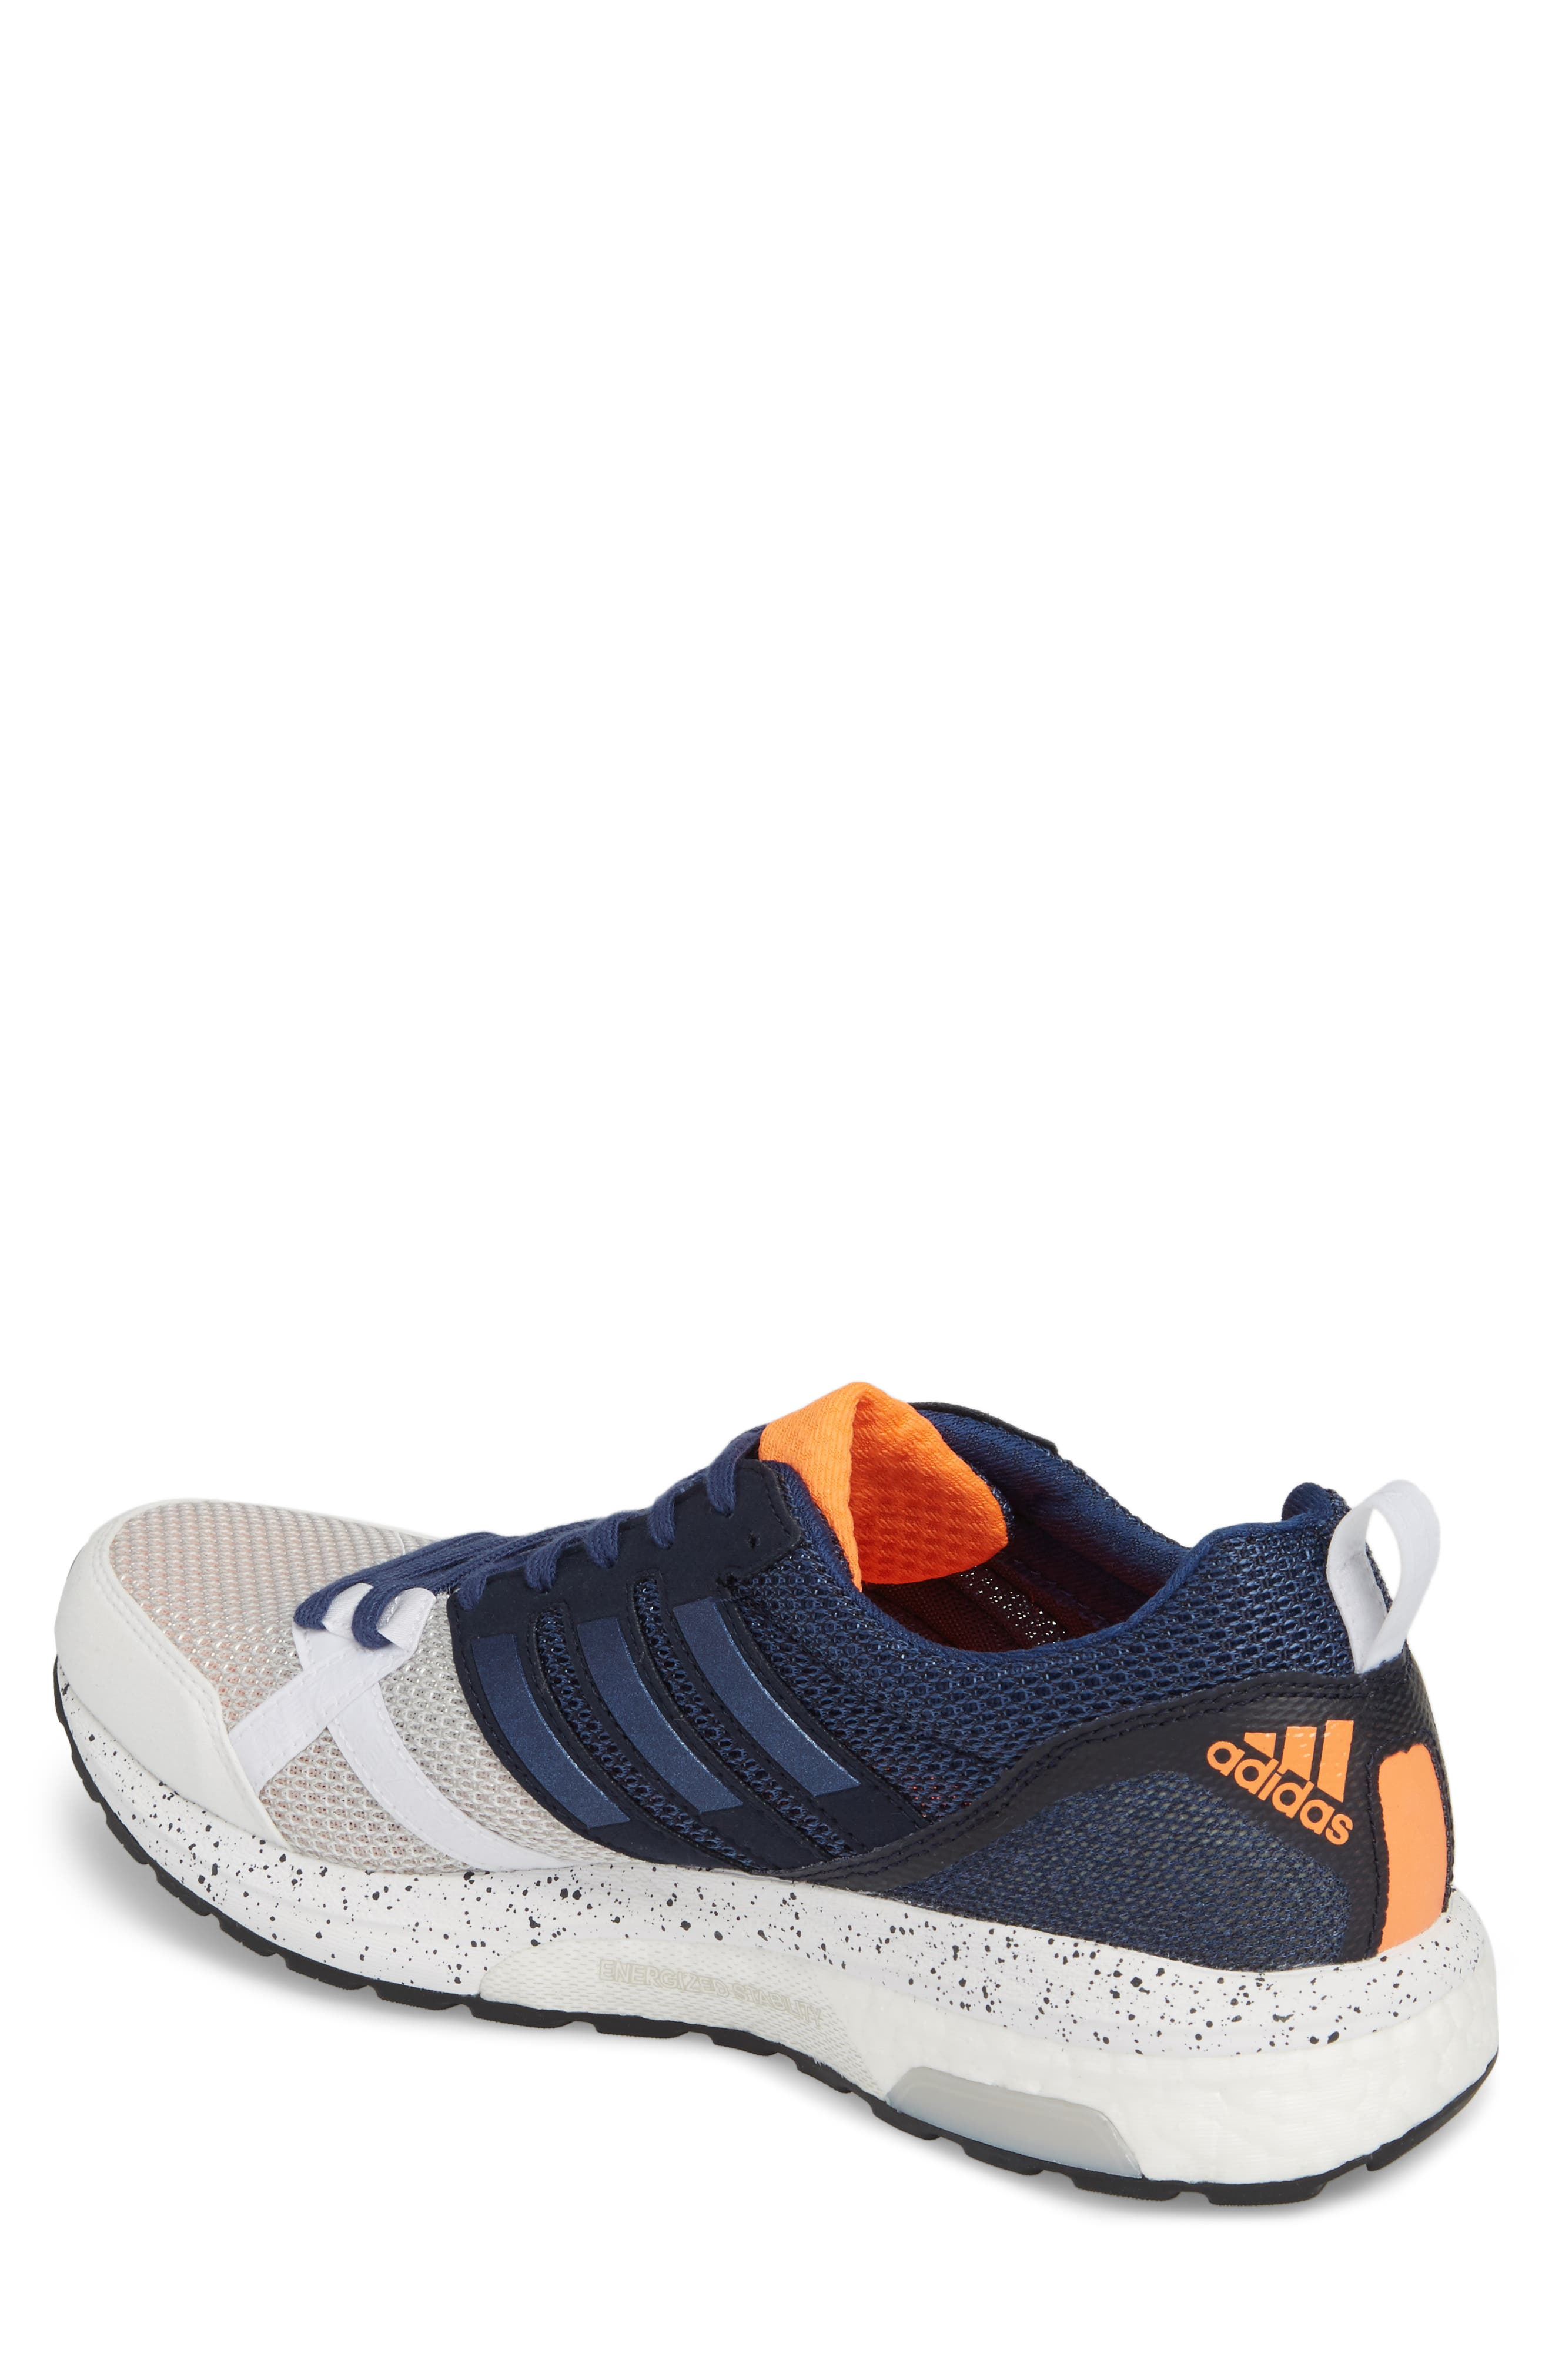 Adizero Tempo 9 M Running Shoe,                             Alternate thumbnail 2, color,                             White/ Indigo/ Core Black